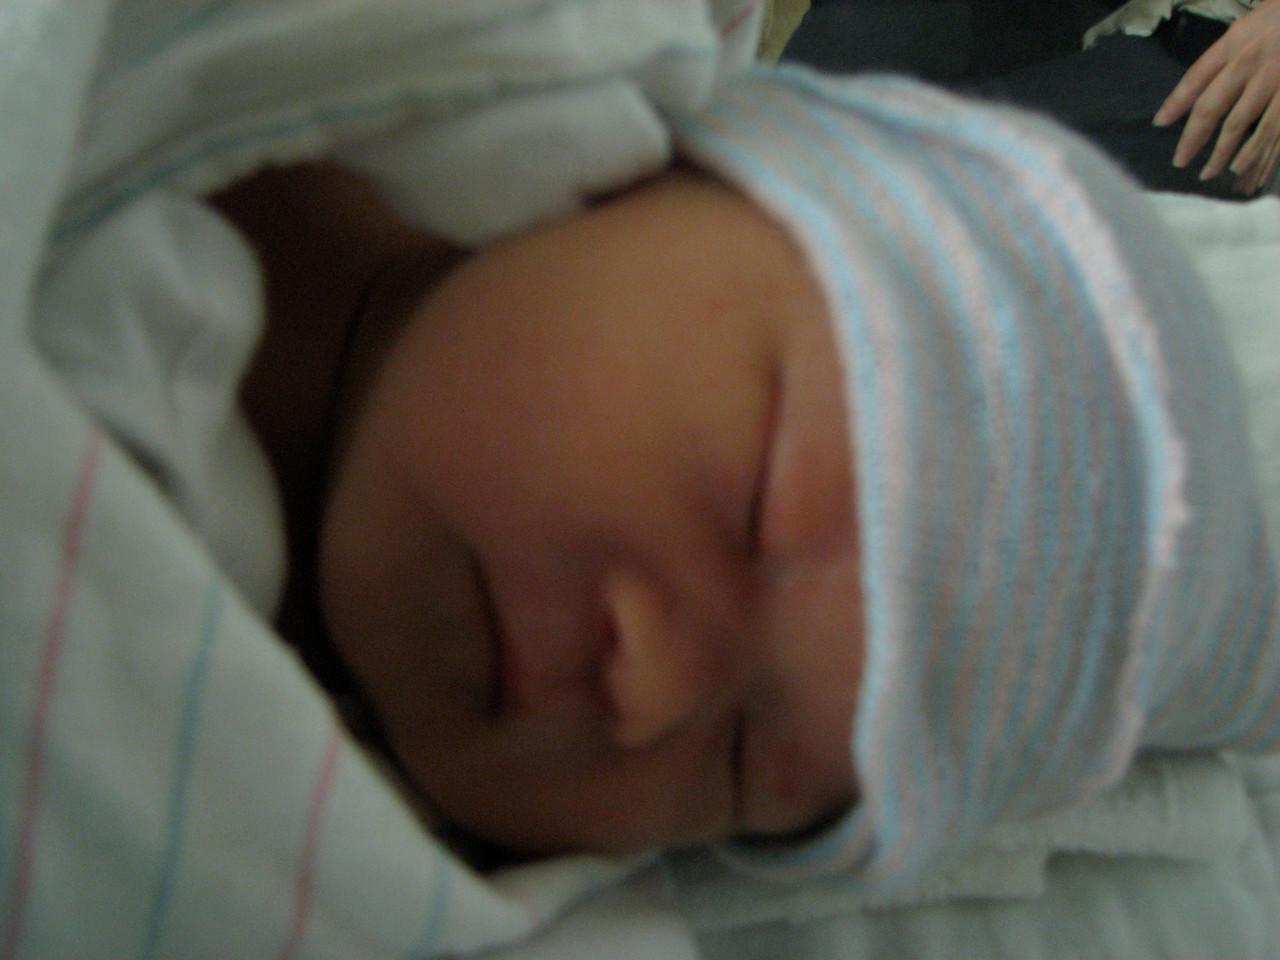 2007 03 23 Fri - Joshua Huang born 3-22-2007